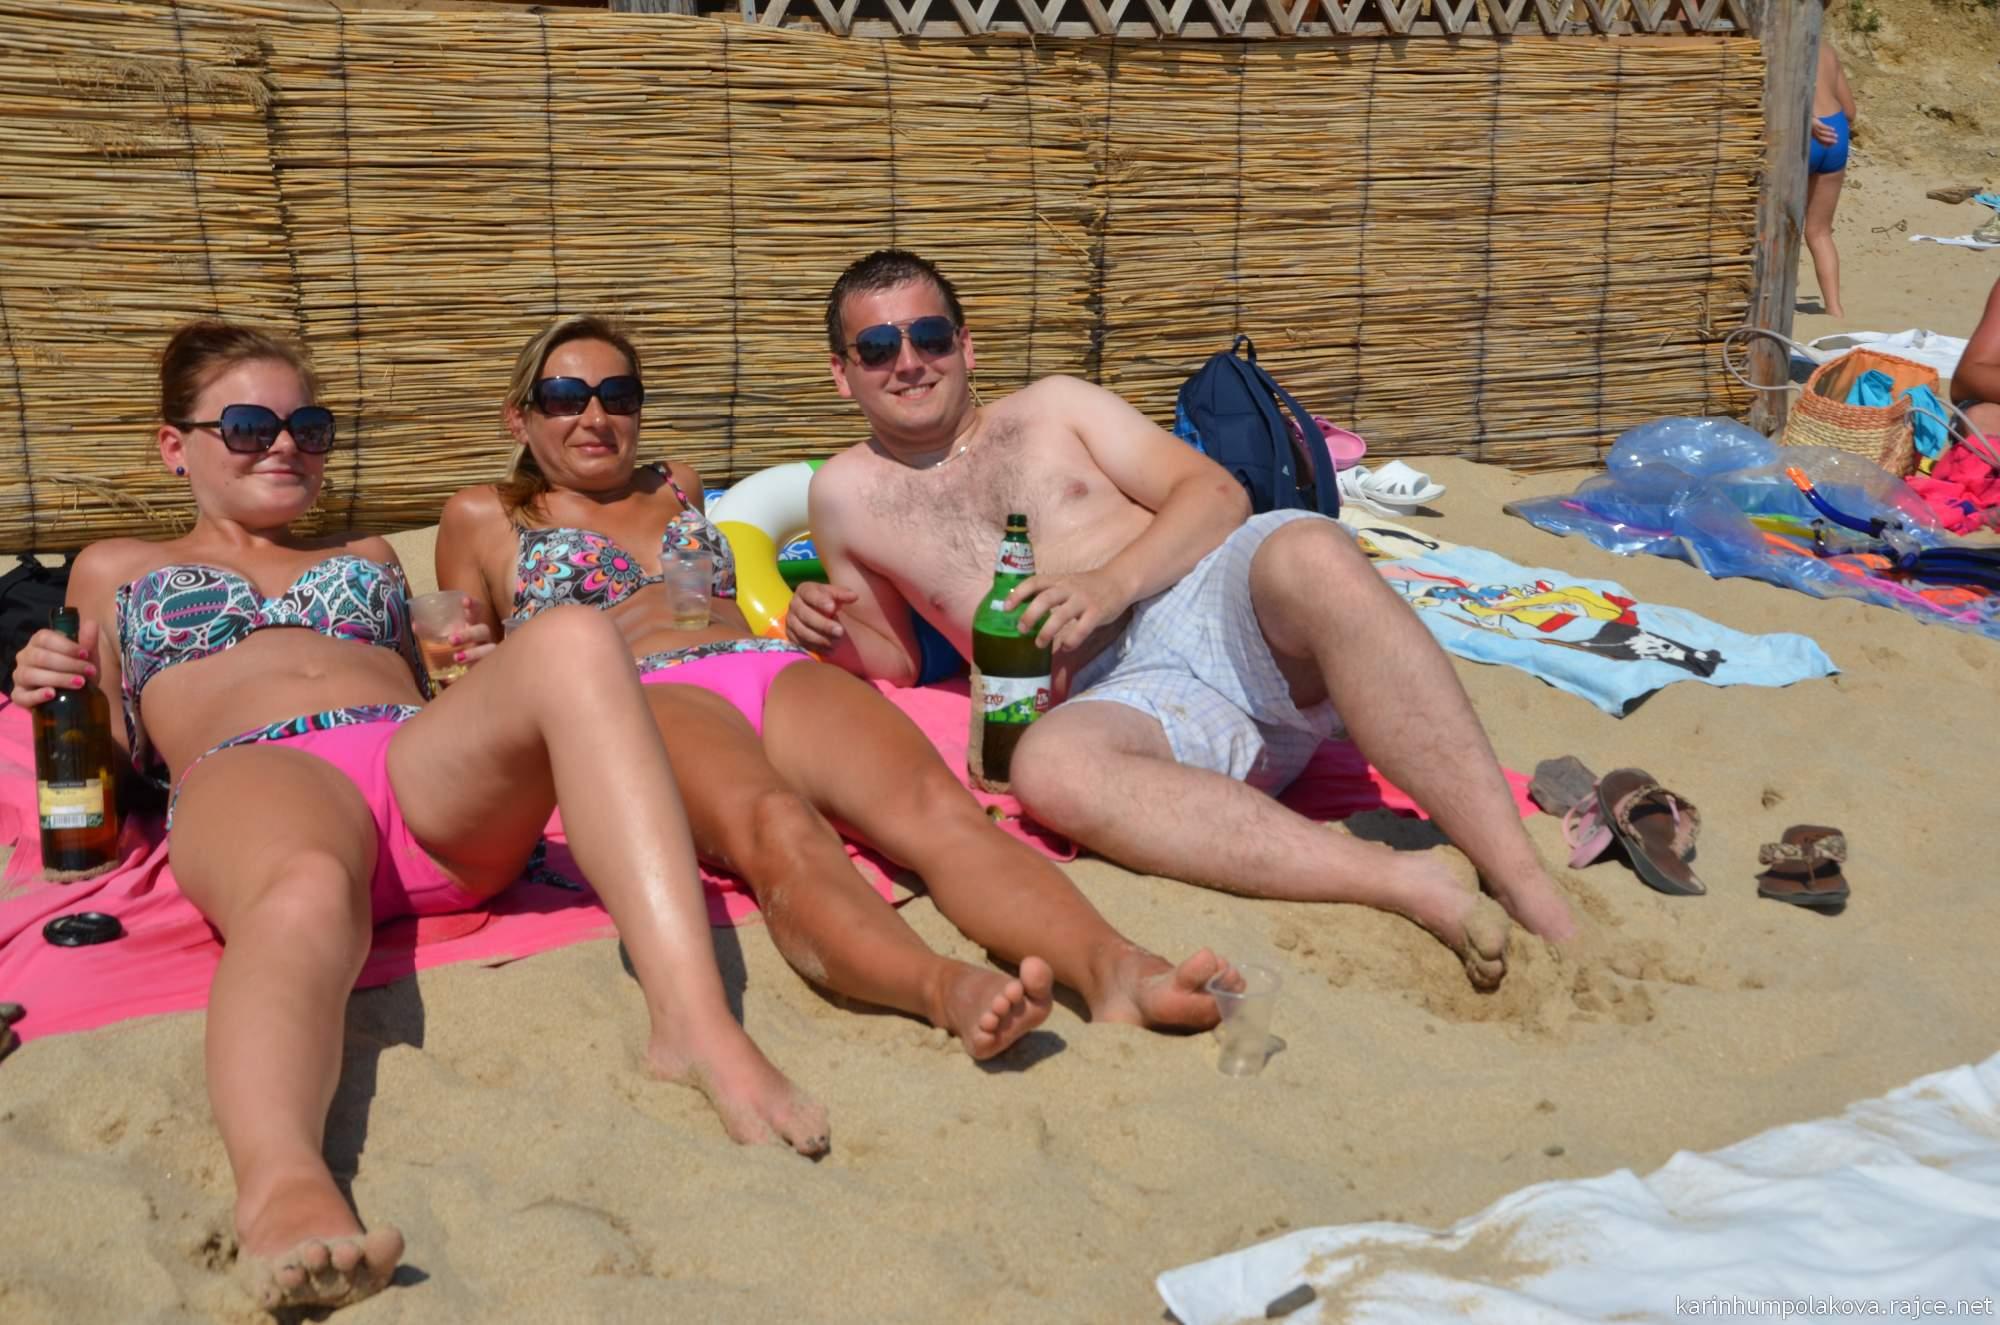 rajce.ru favdolls naked girls